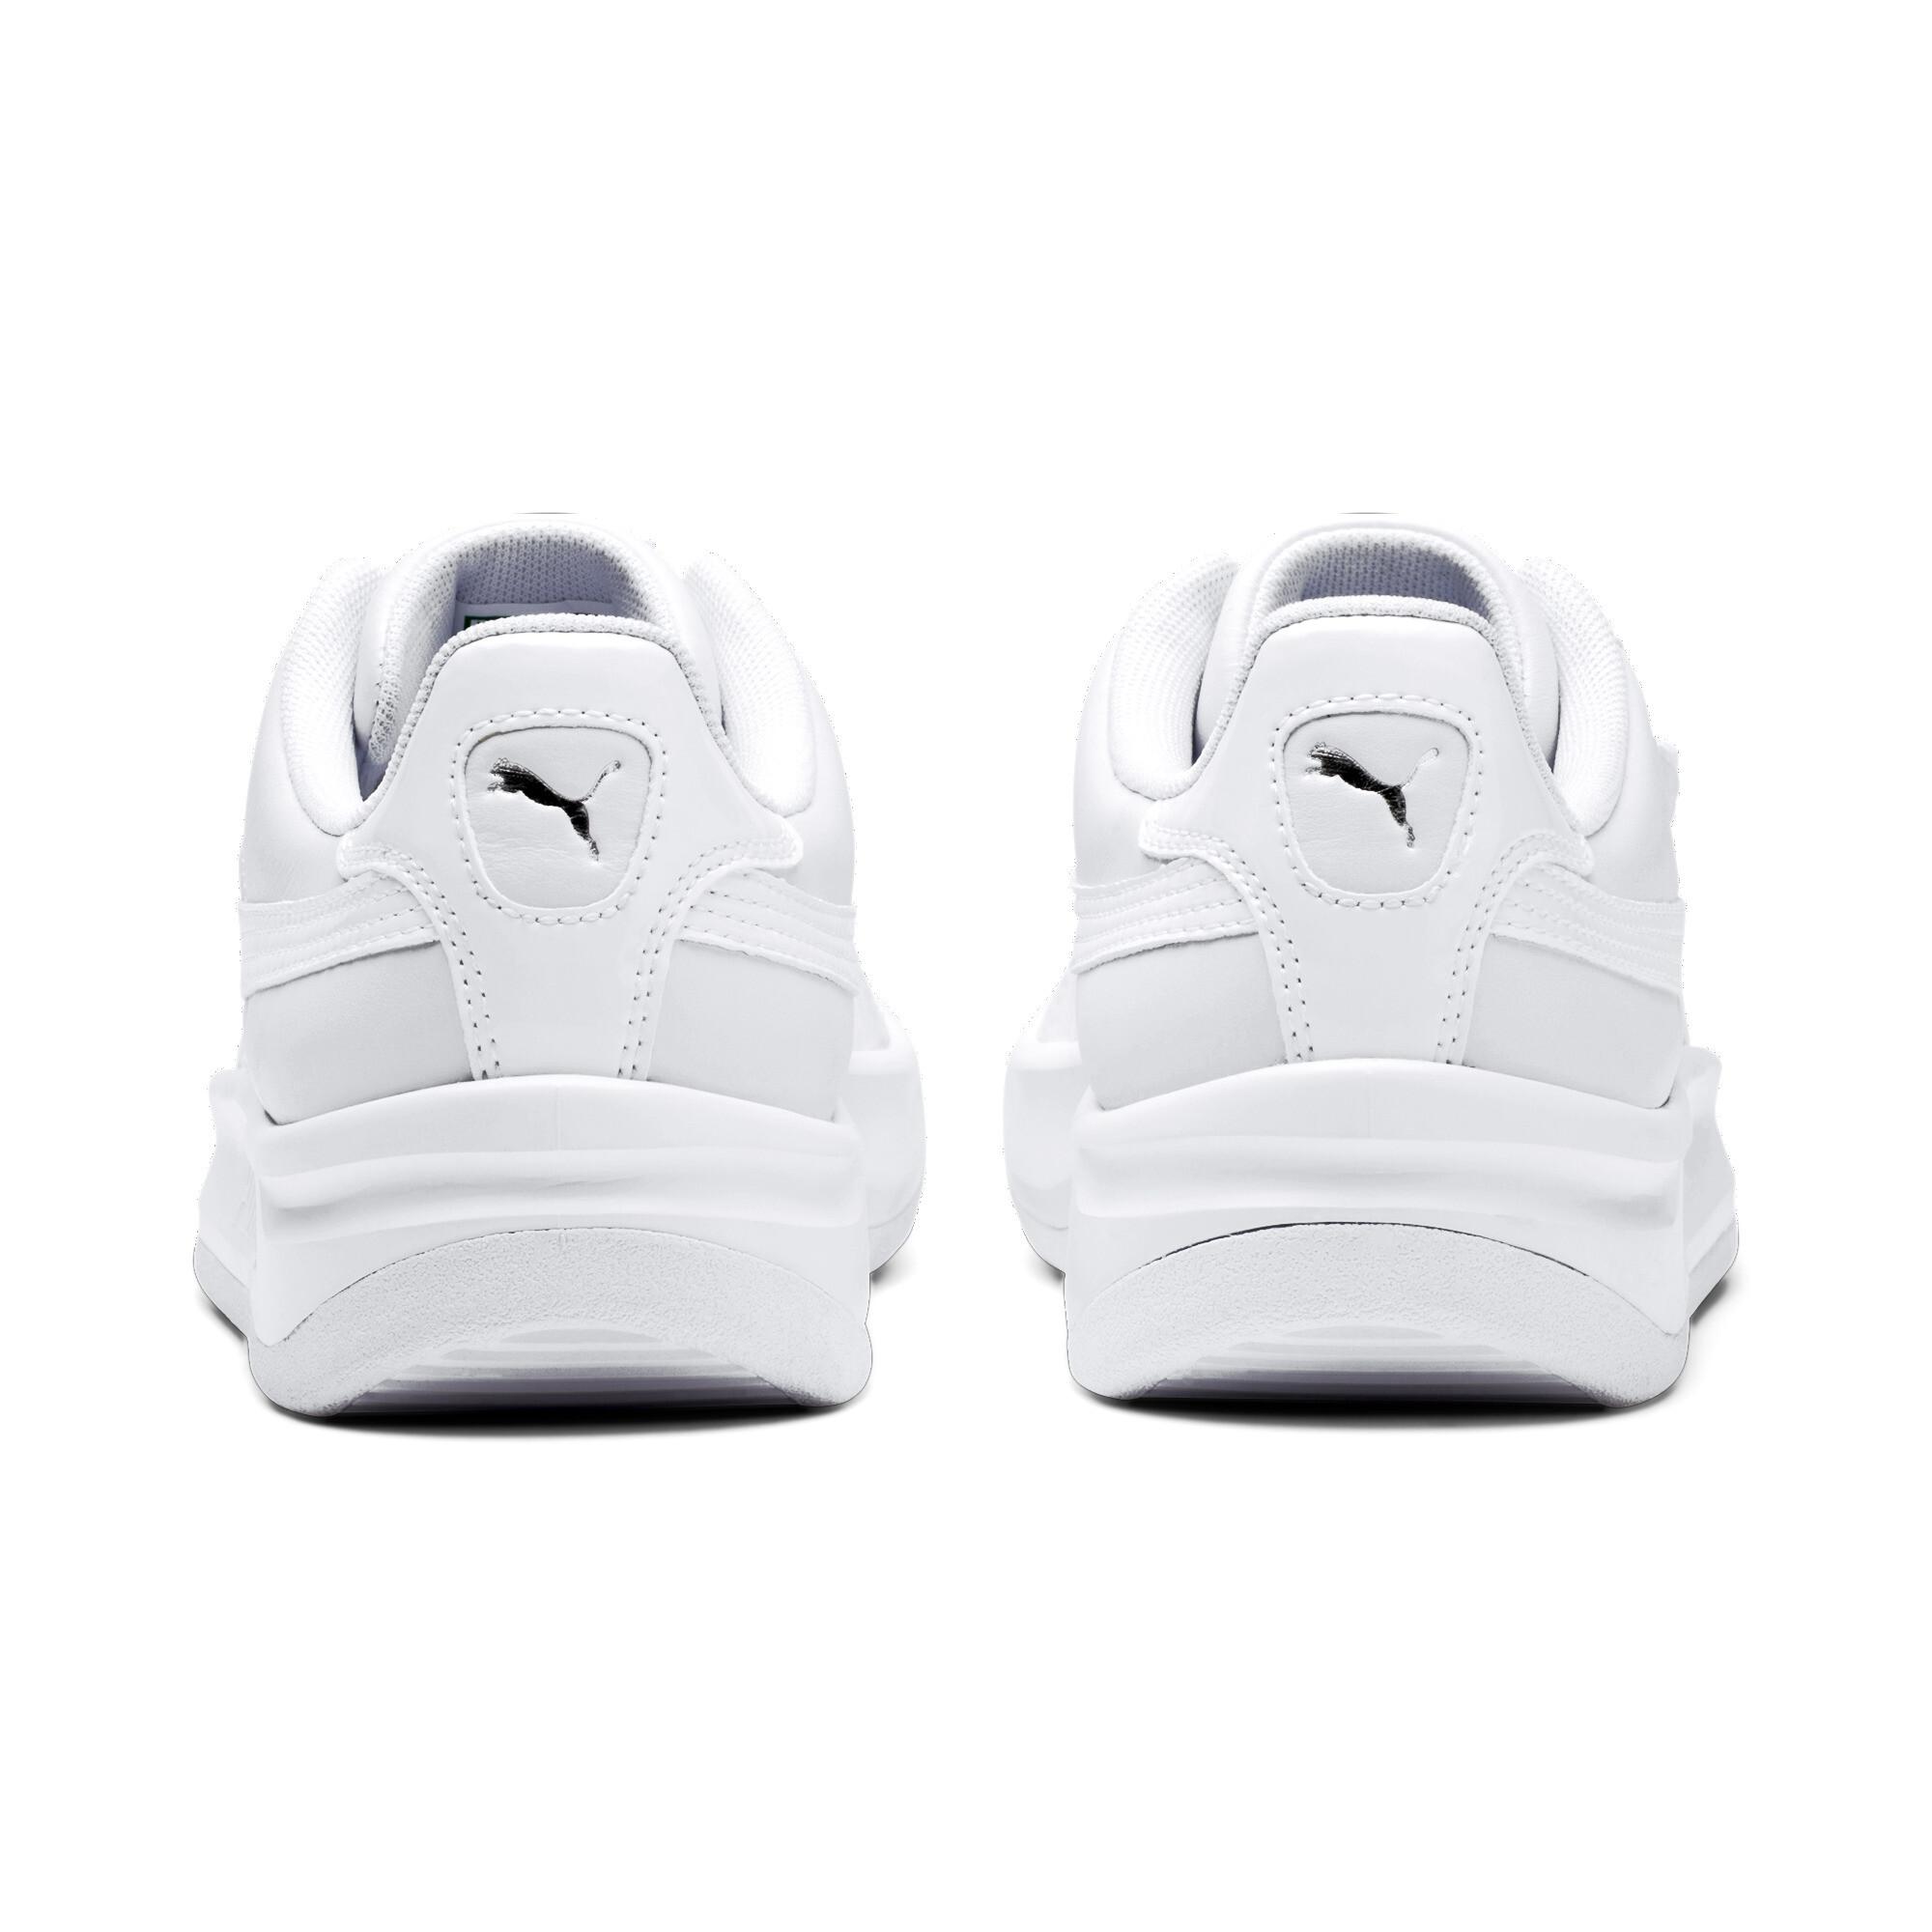 PUMA-Women-039-s-California-Monochrome-Sneakers thumbnail 8